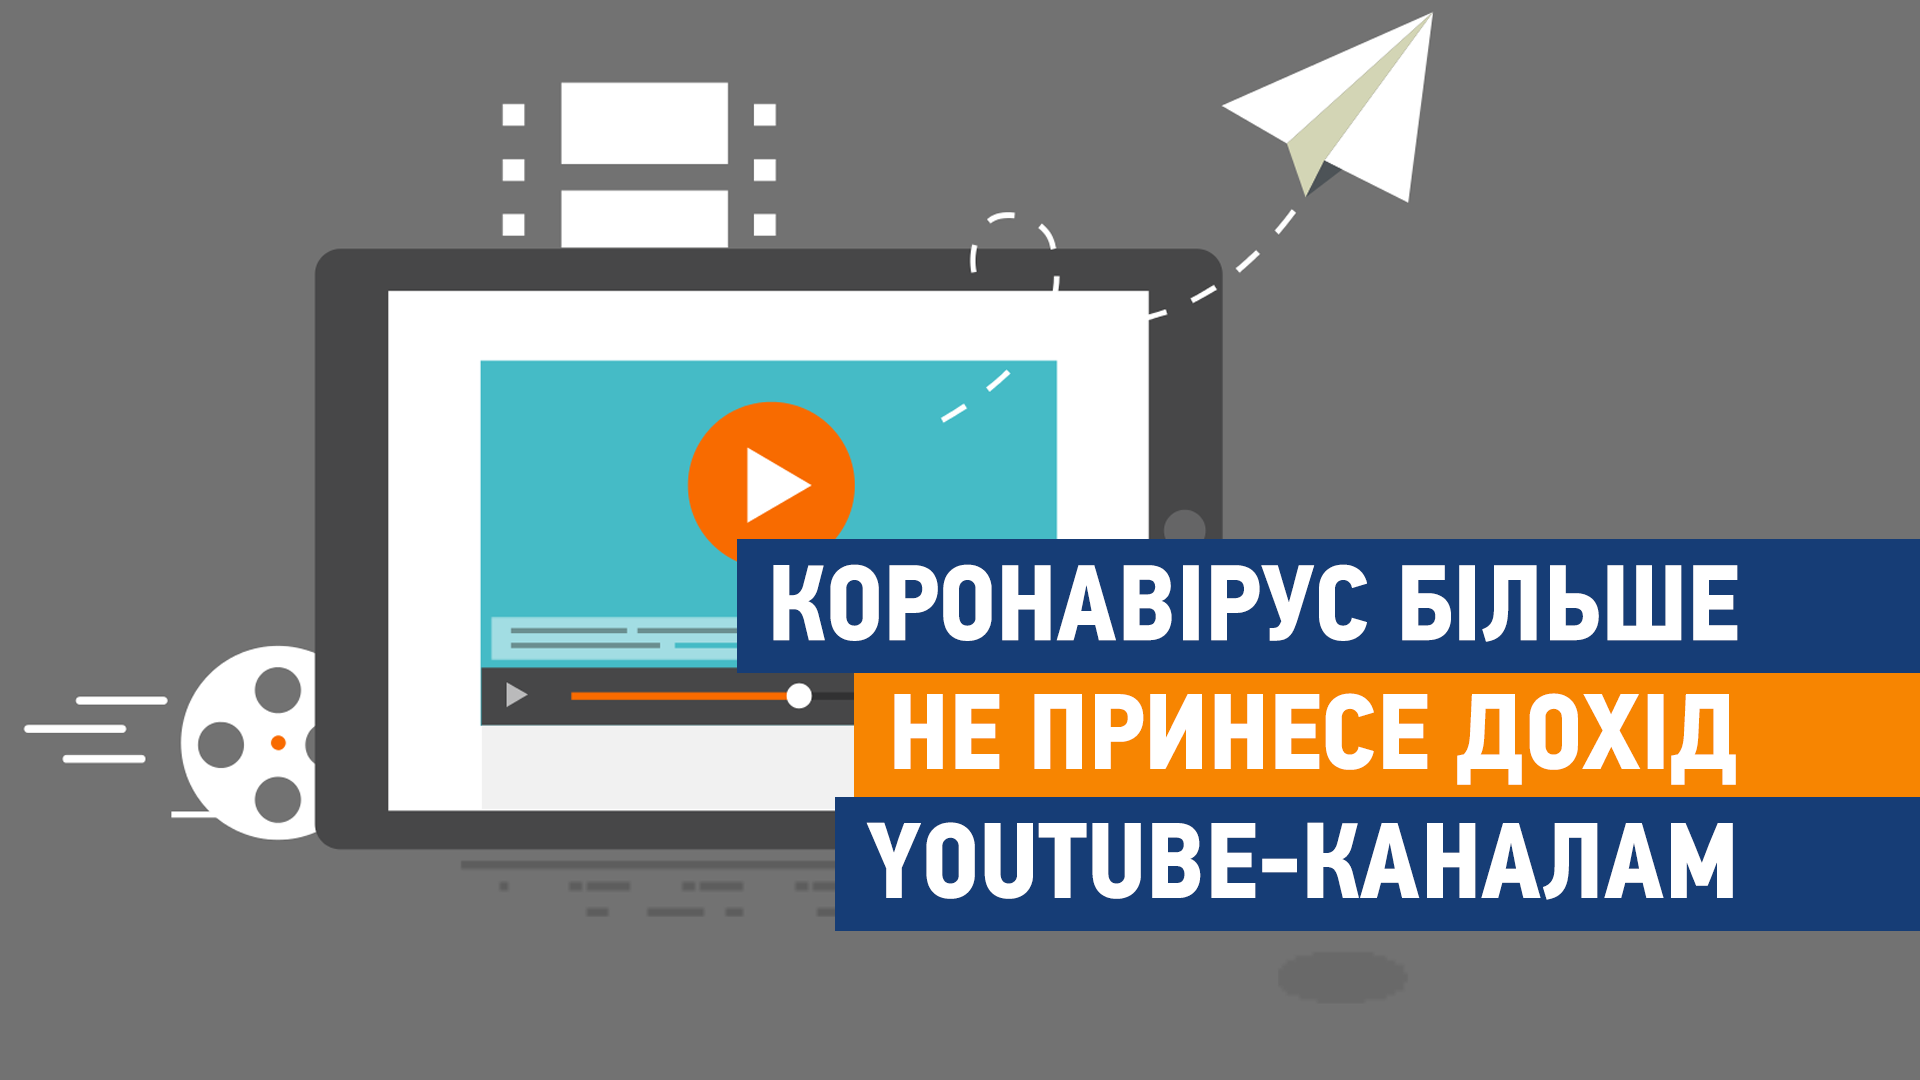 Коронавірус більше не принесе дохід власникам YouTube-каналів - коронавірус, youtube, google, COVID-19 - youtube poglyad